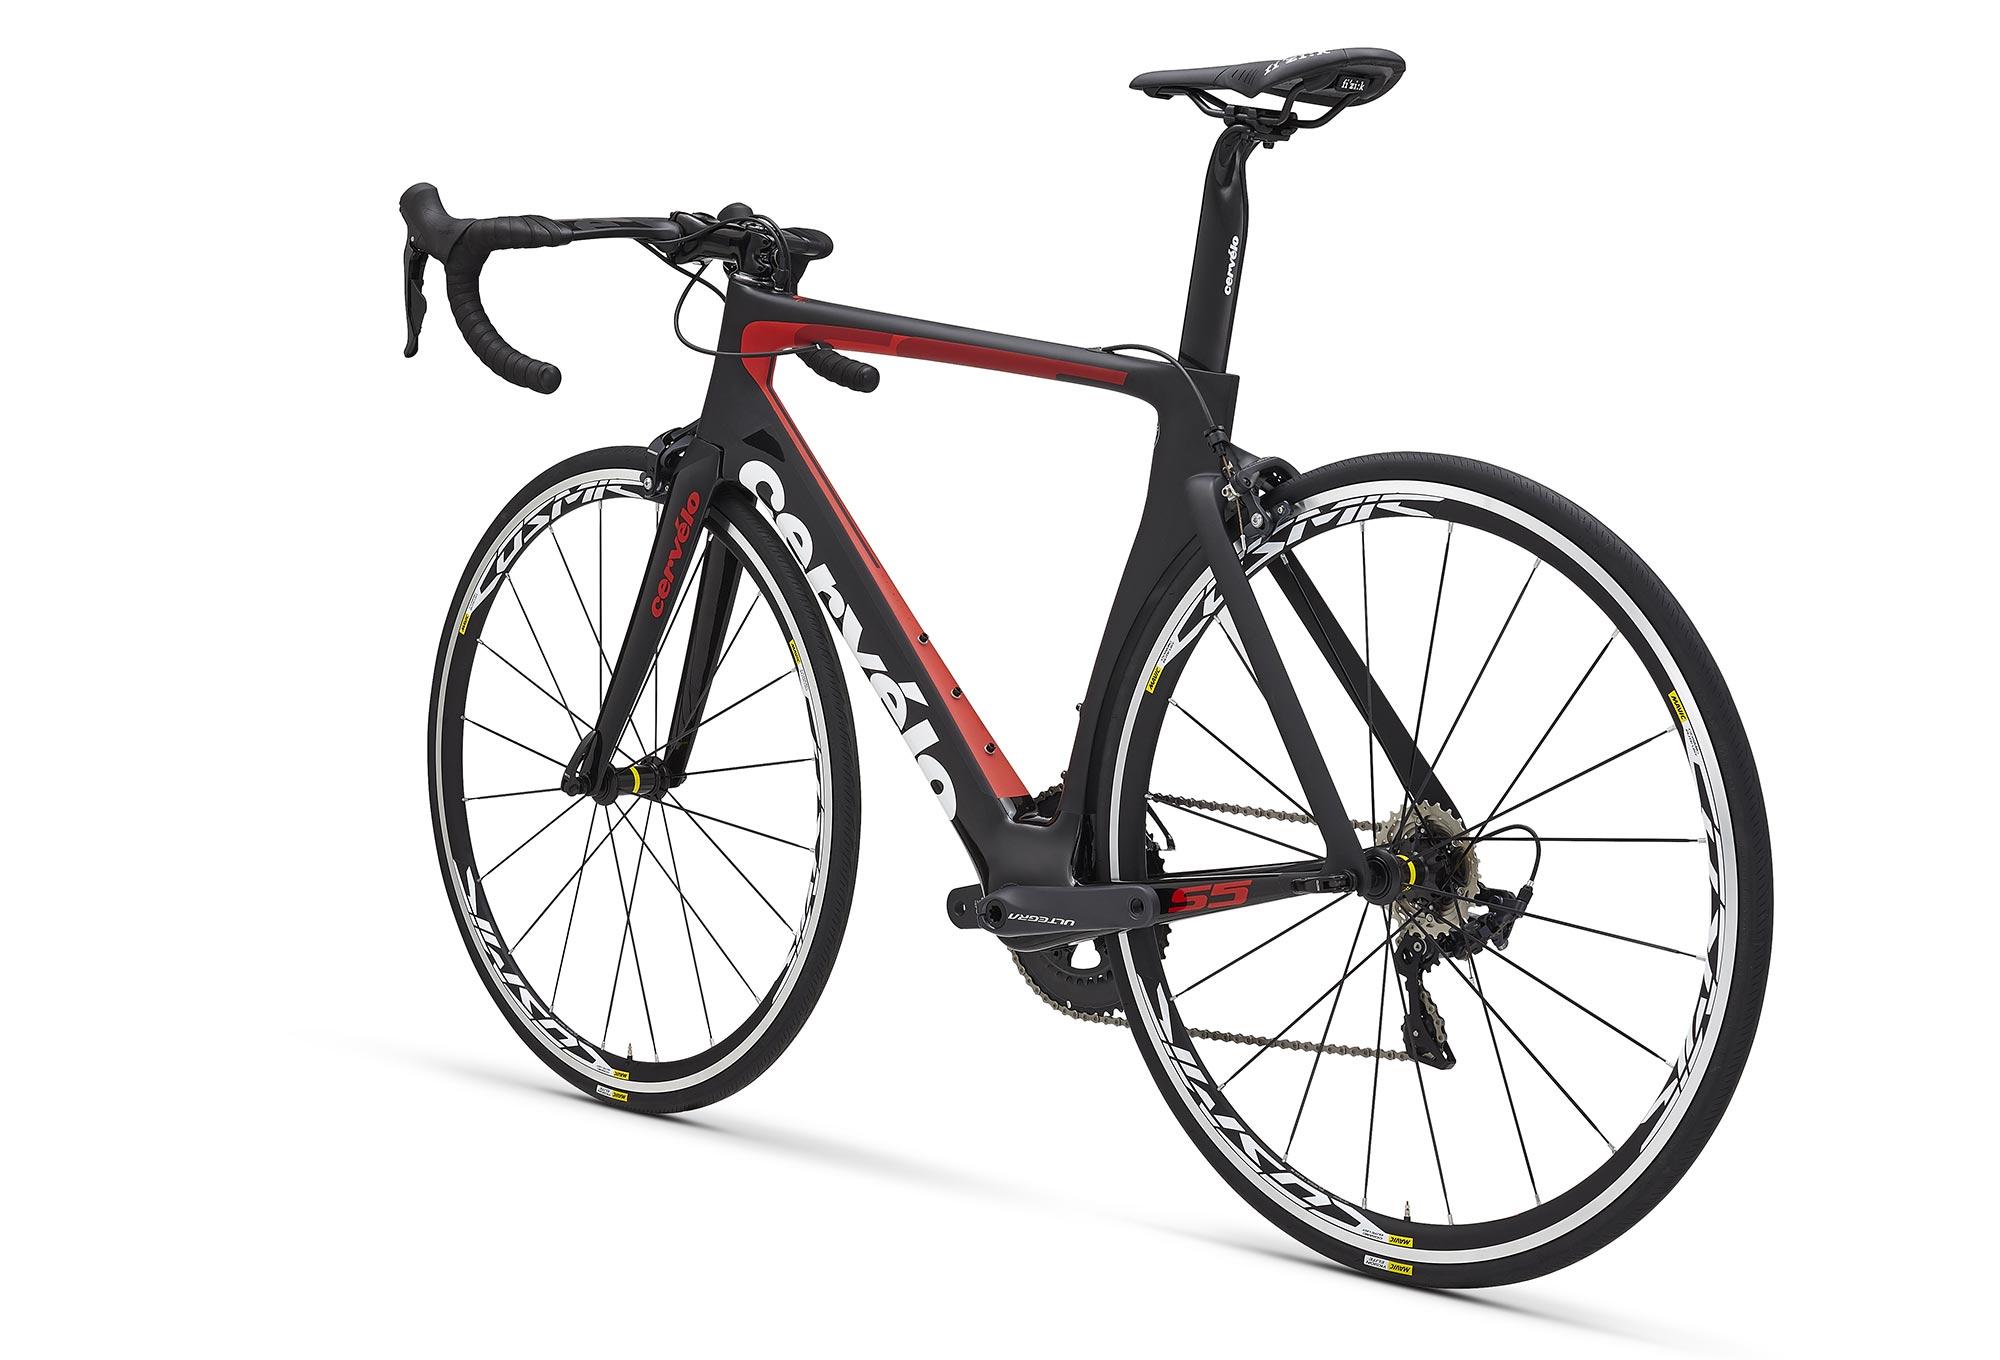 babb458a4b0 Cervélo S5 Road Bike Shimano Ultegra 8000 11S 2018 Black / Red ...